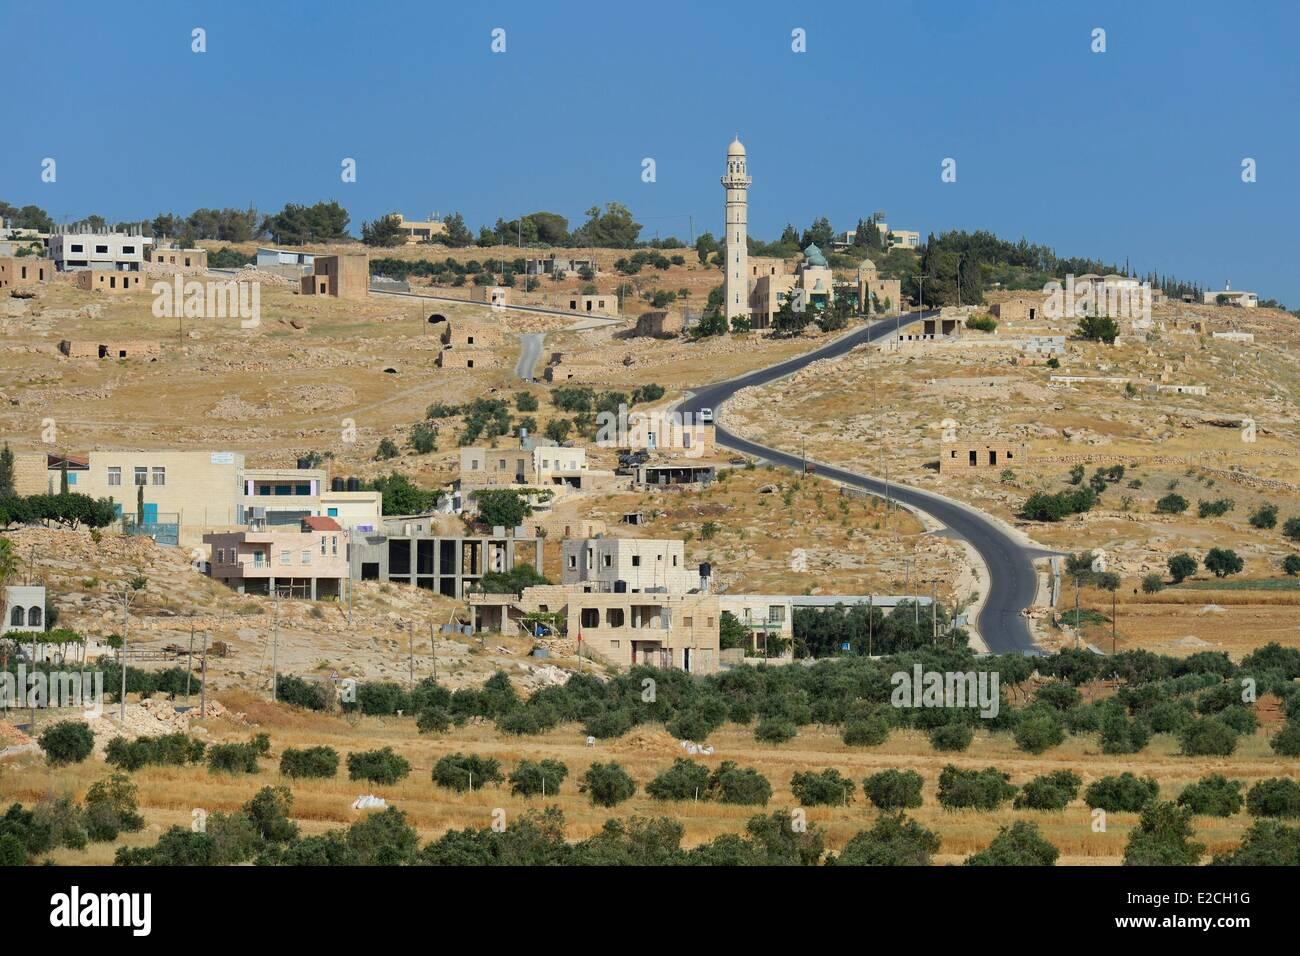 Palestine, West Bank (disputed territory), Bethlehem region, Bayt Ta'mar village - Stock Image